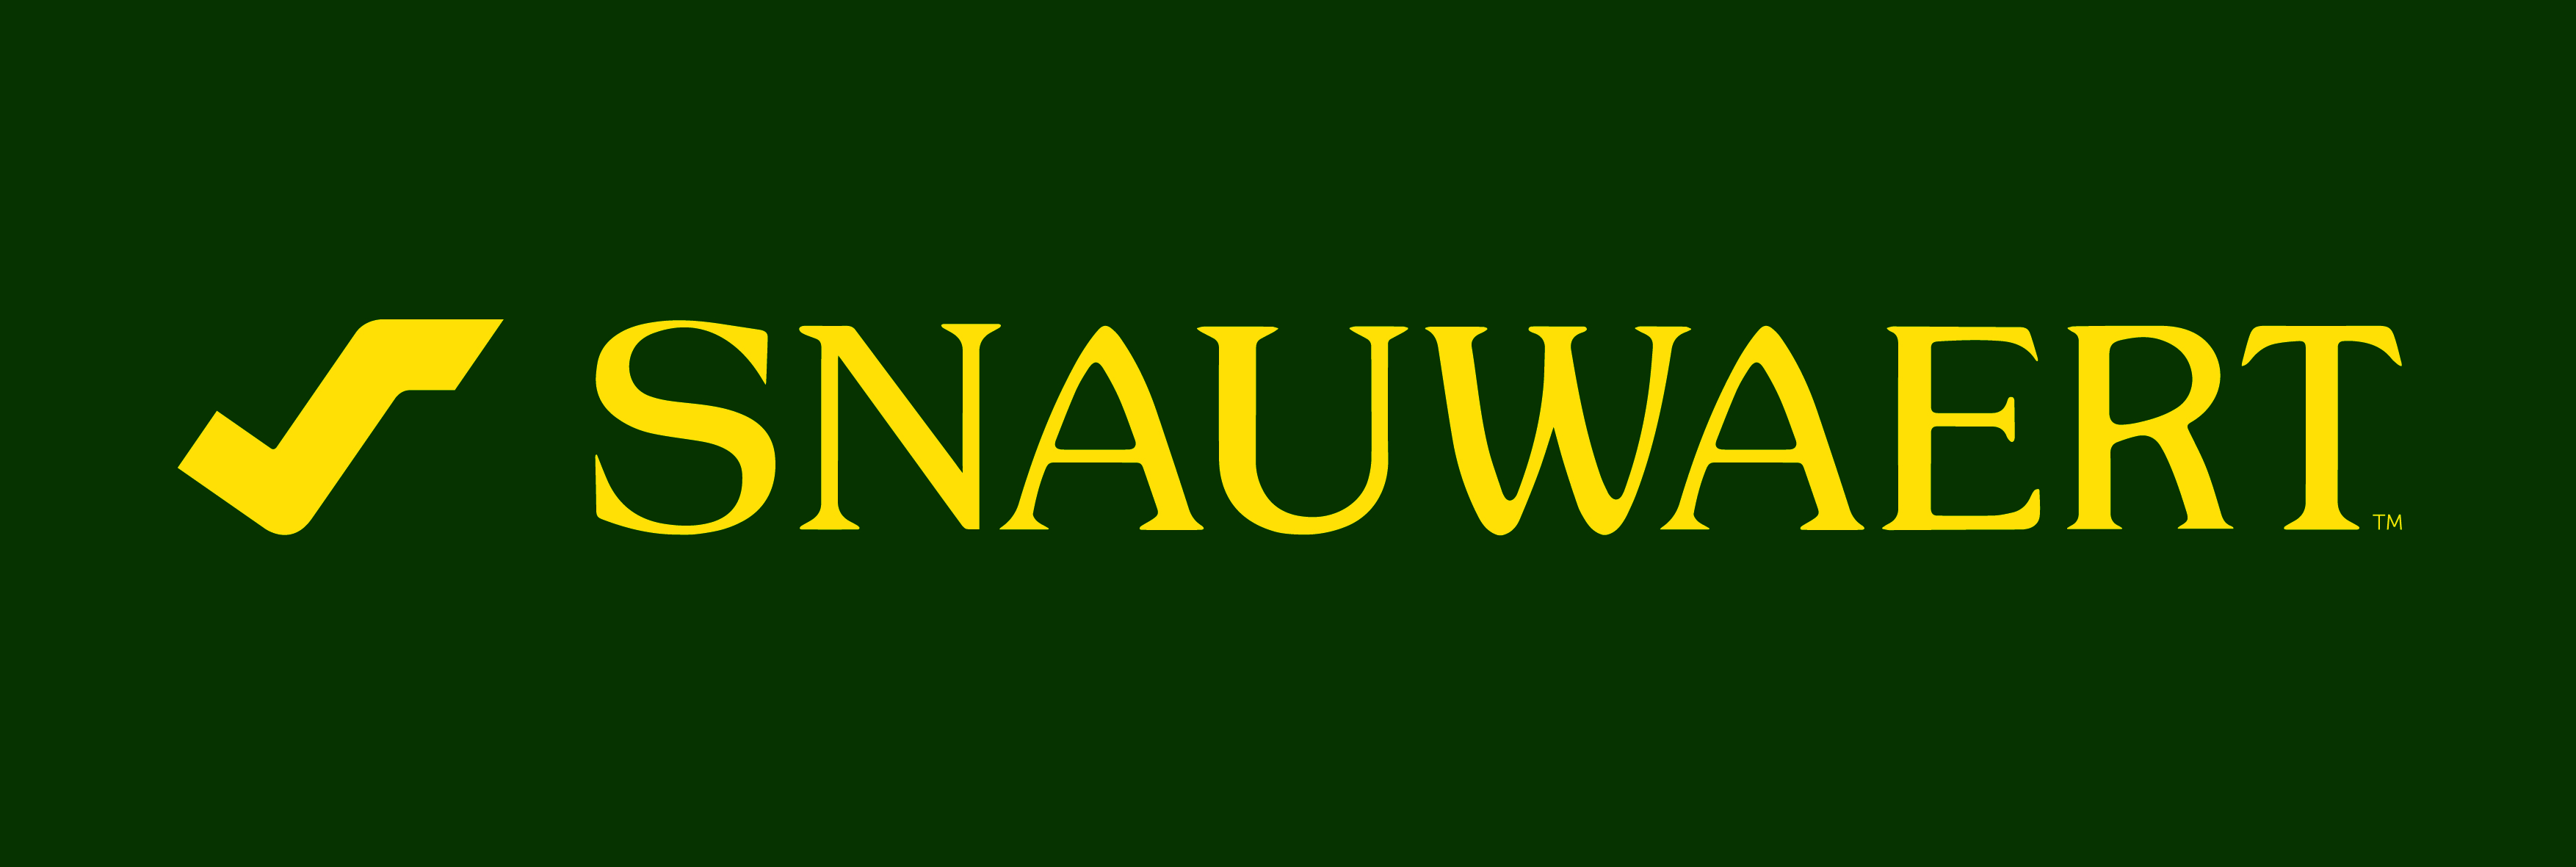 snauwaert-logo_greenyellow